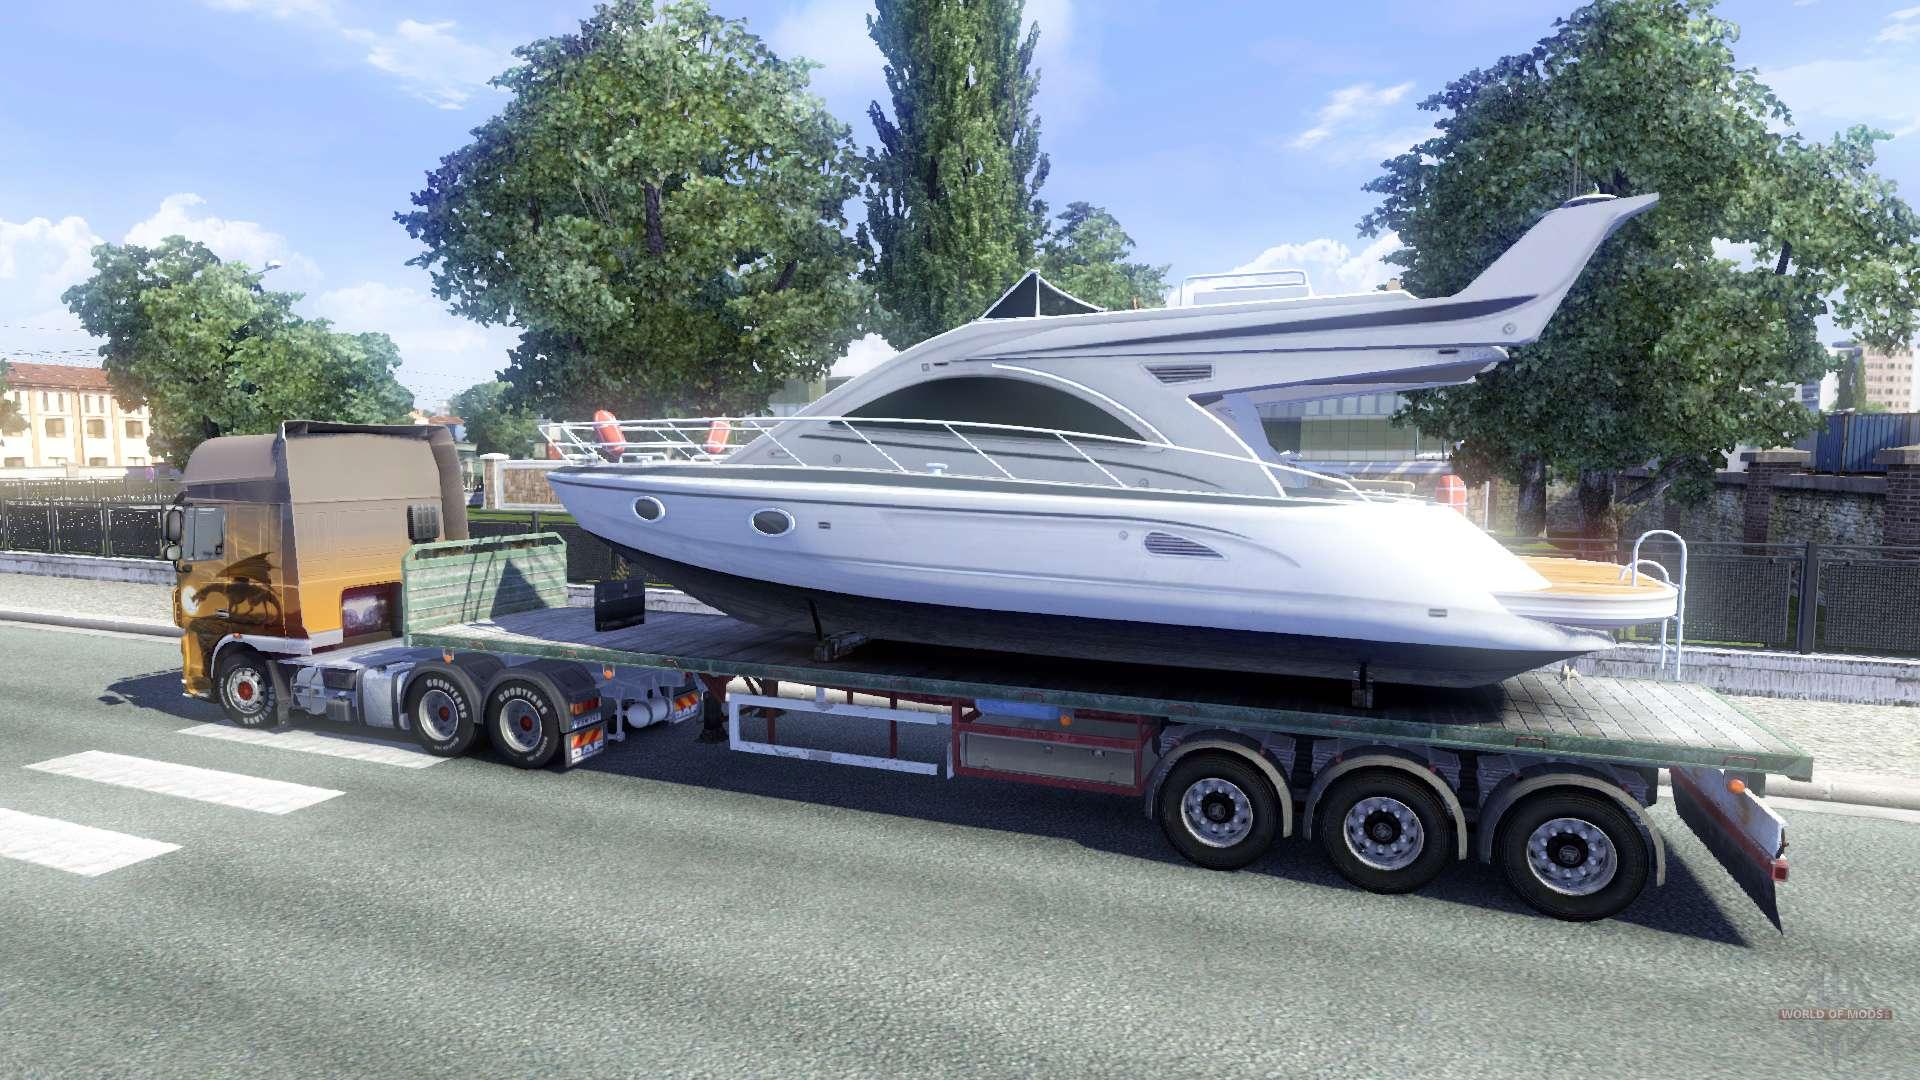 der trailer mit dem boot f r euro truck simulator 2. Black Bedroom Furniture Sets. Home Design Ideas